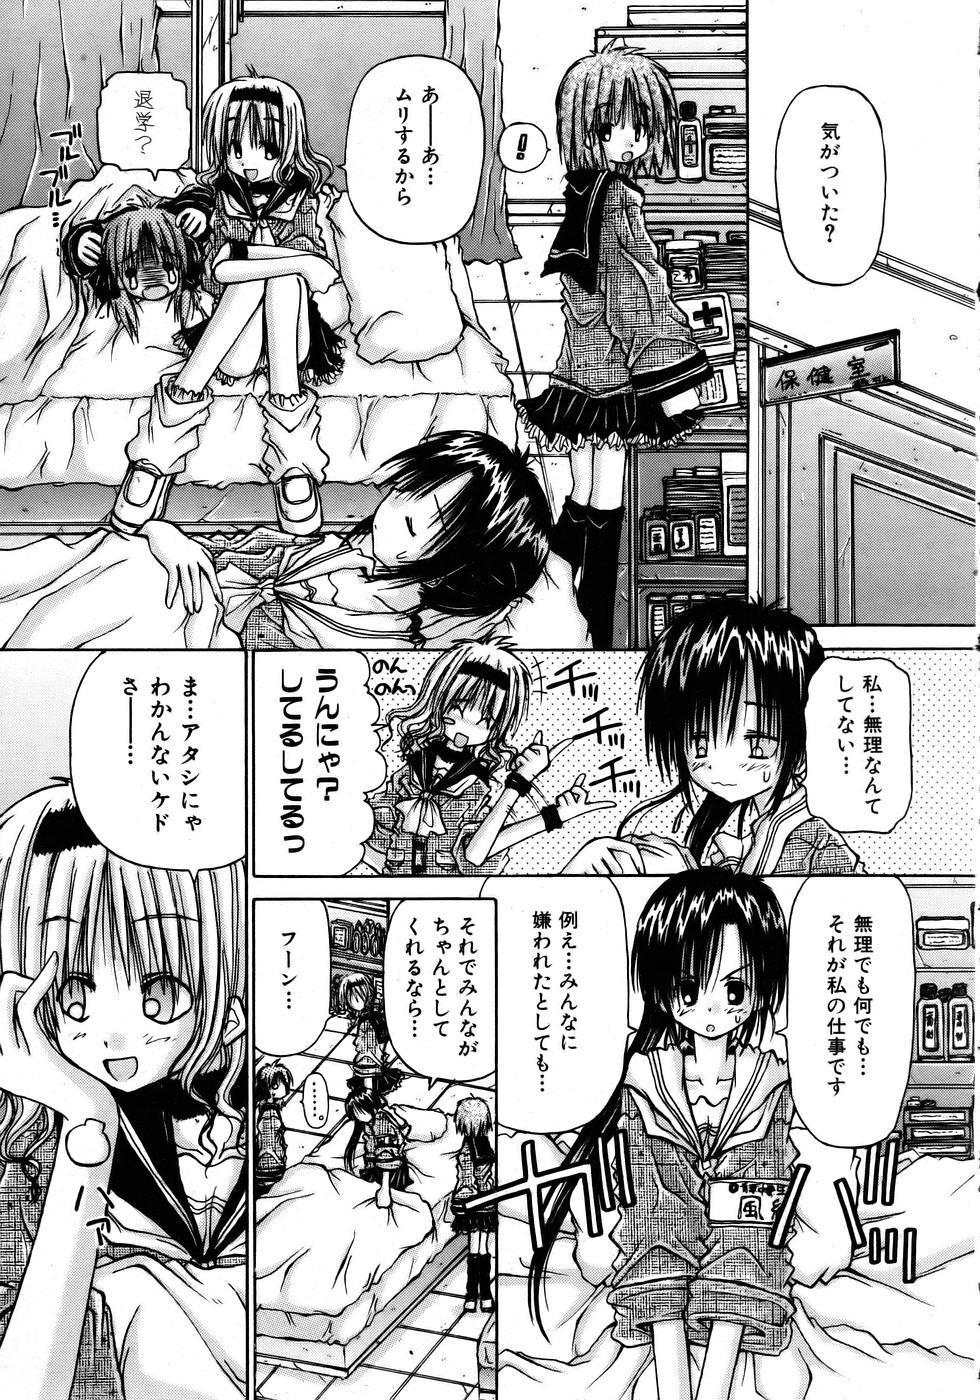 COMIC AUN 2005-12 Vol. 115 374